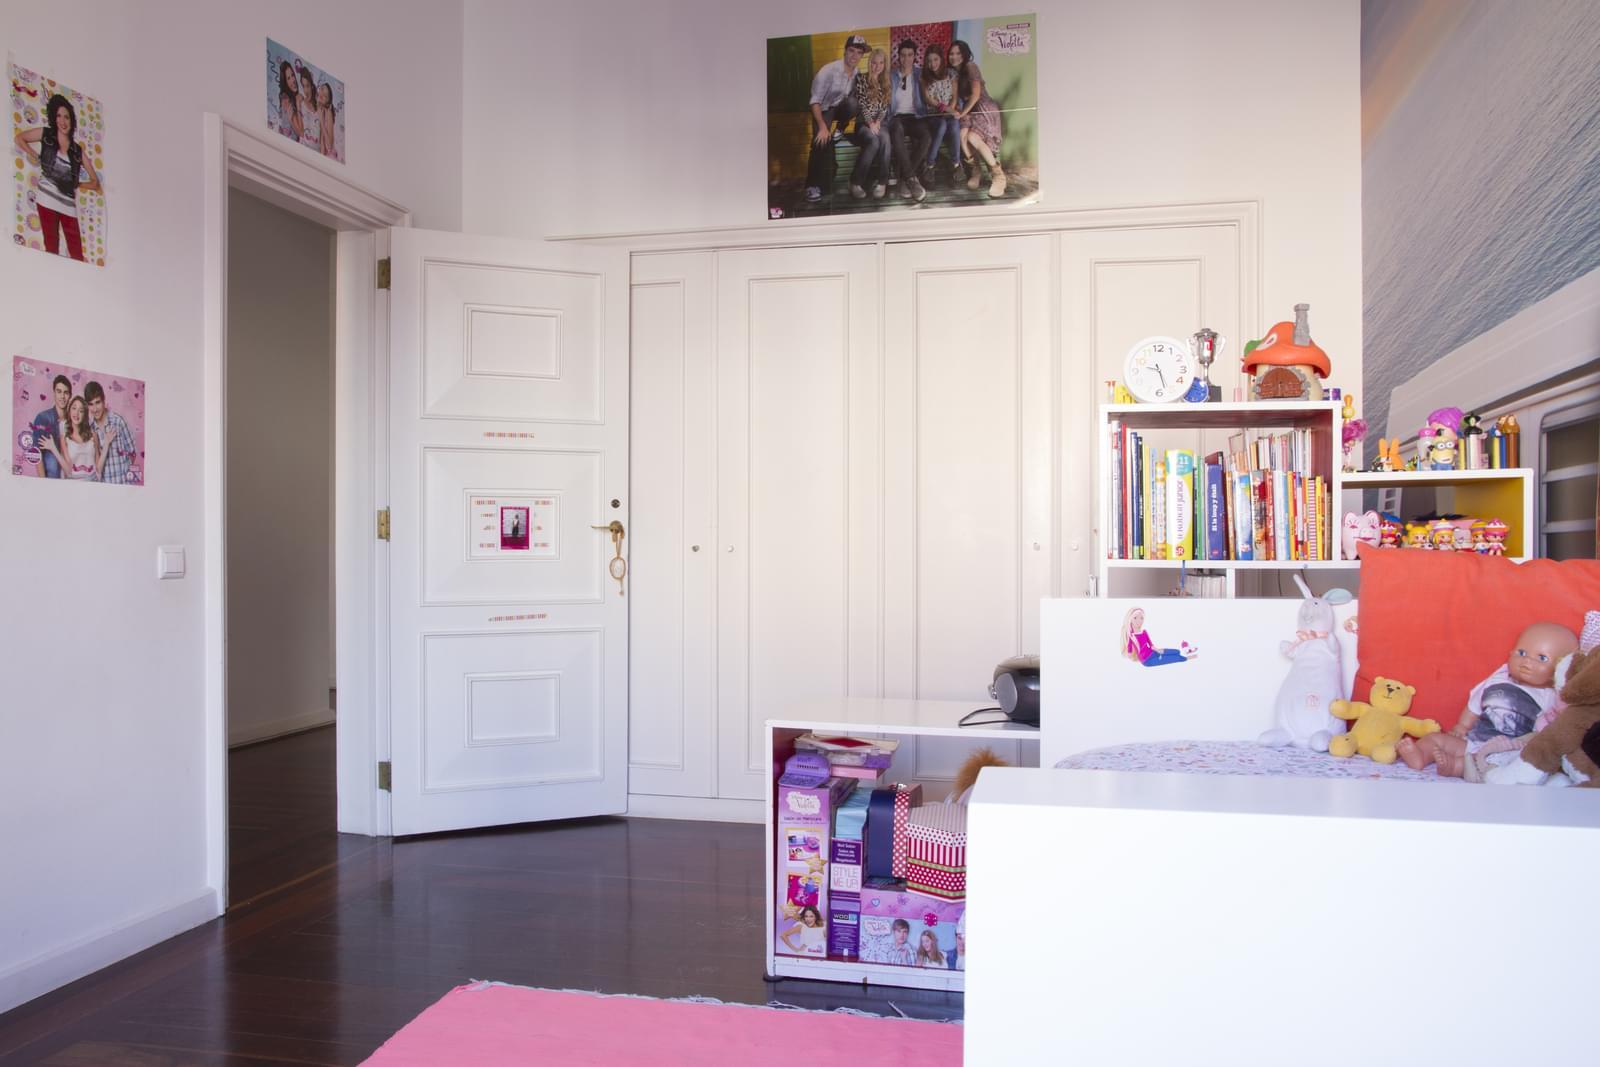 pf18175-apartamento-t5-lisboa-d351e67b-d648-4b66-86ac-2b31dd58f6a5